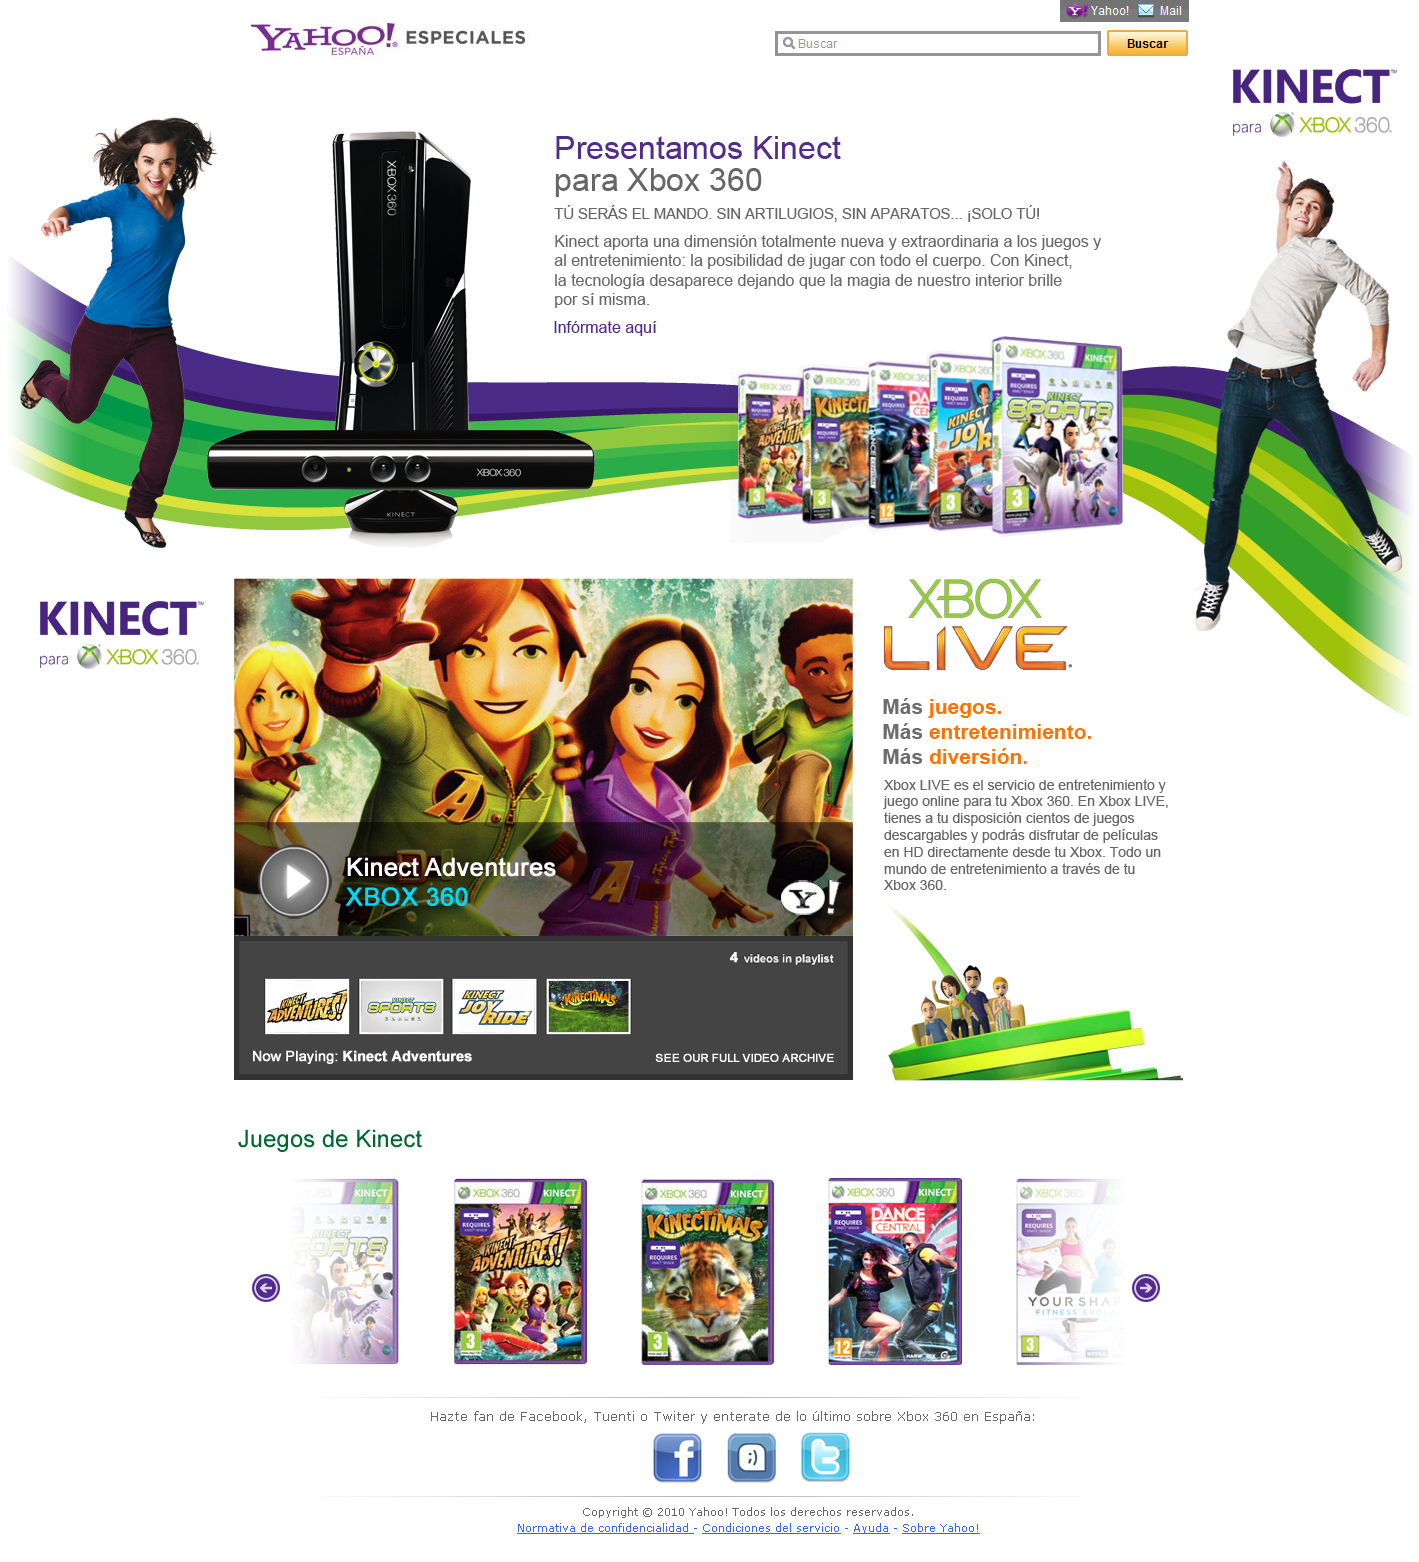 Marketing website development for Yahoo! and Xbox 360 - Web Design in Farnborough